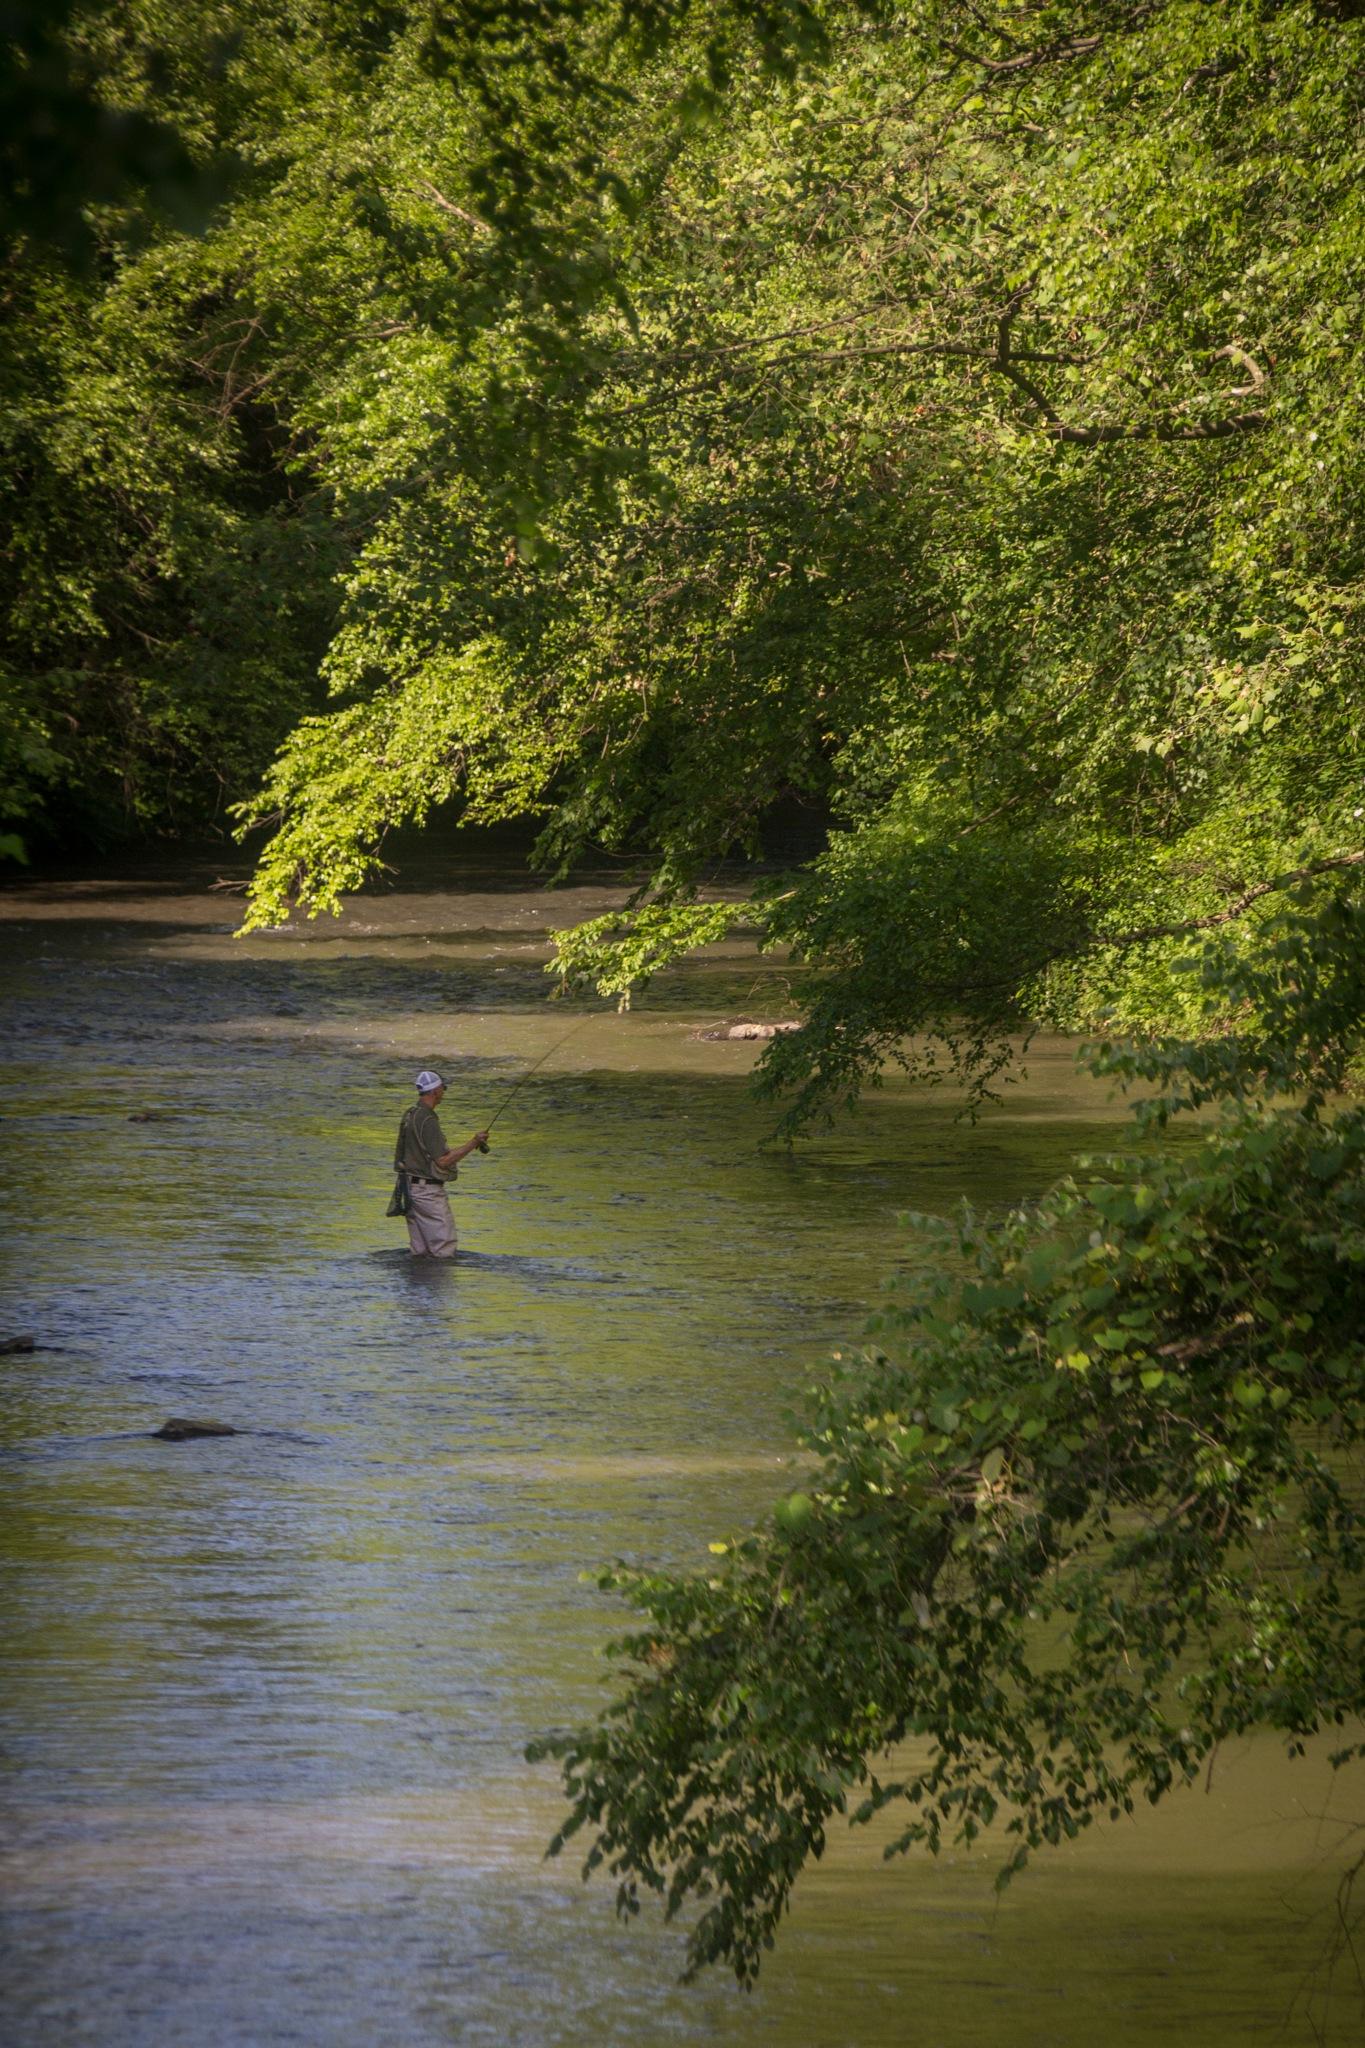 Little Schuylkill River Fisherman by Otto Jay Lehrbach